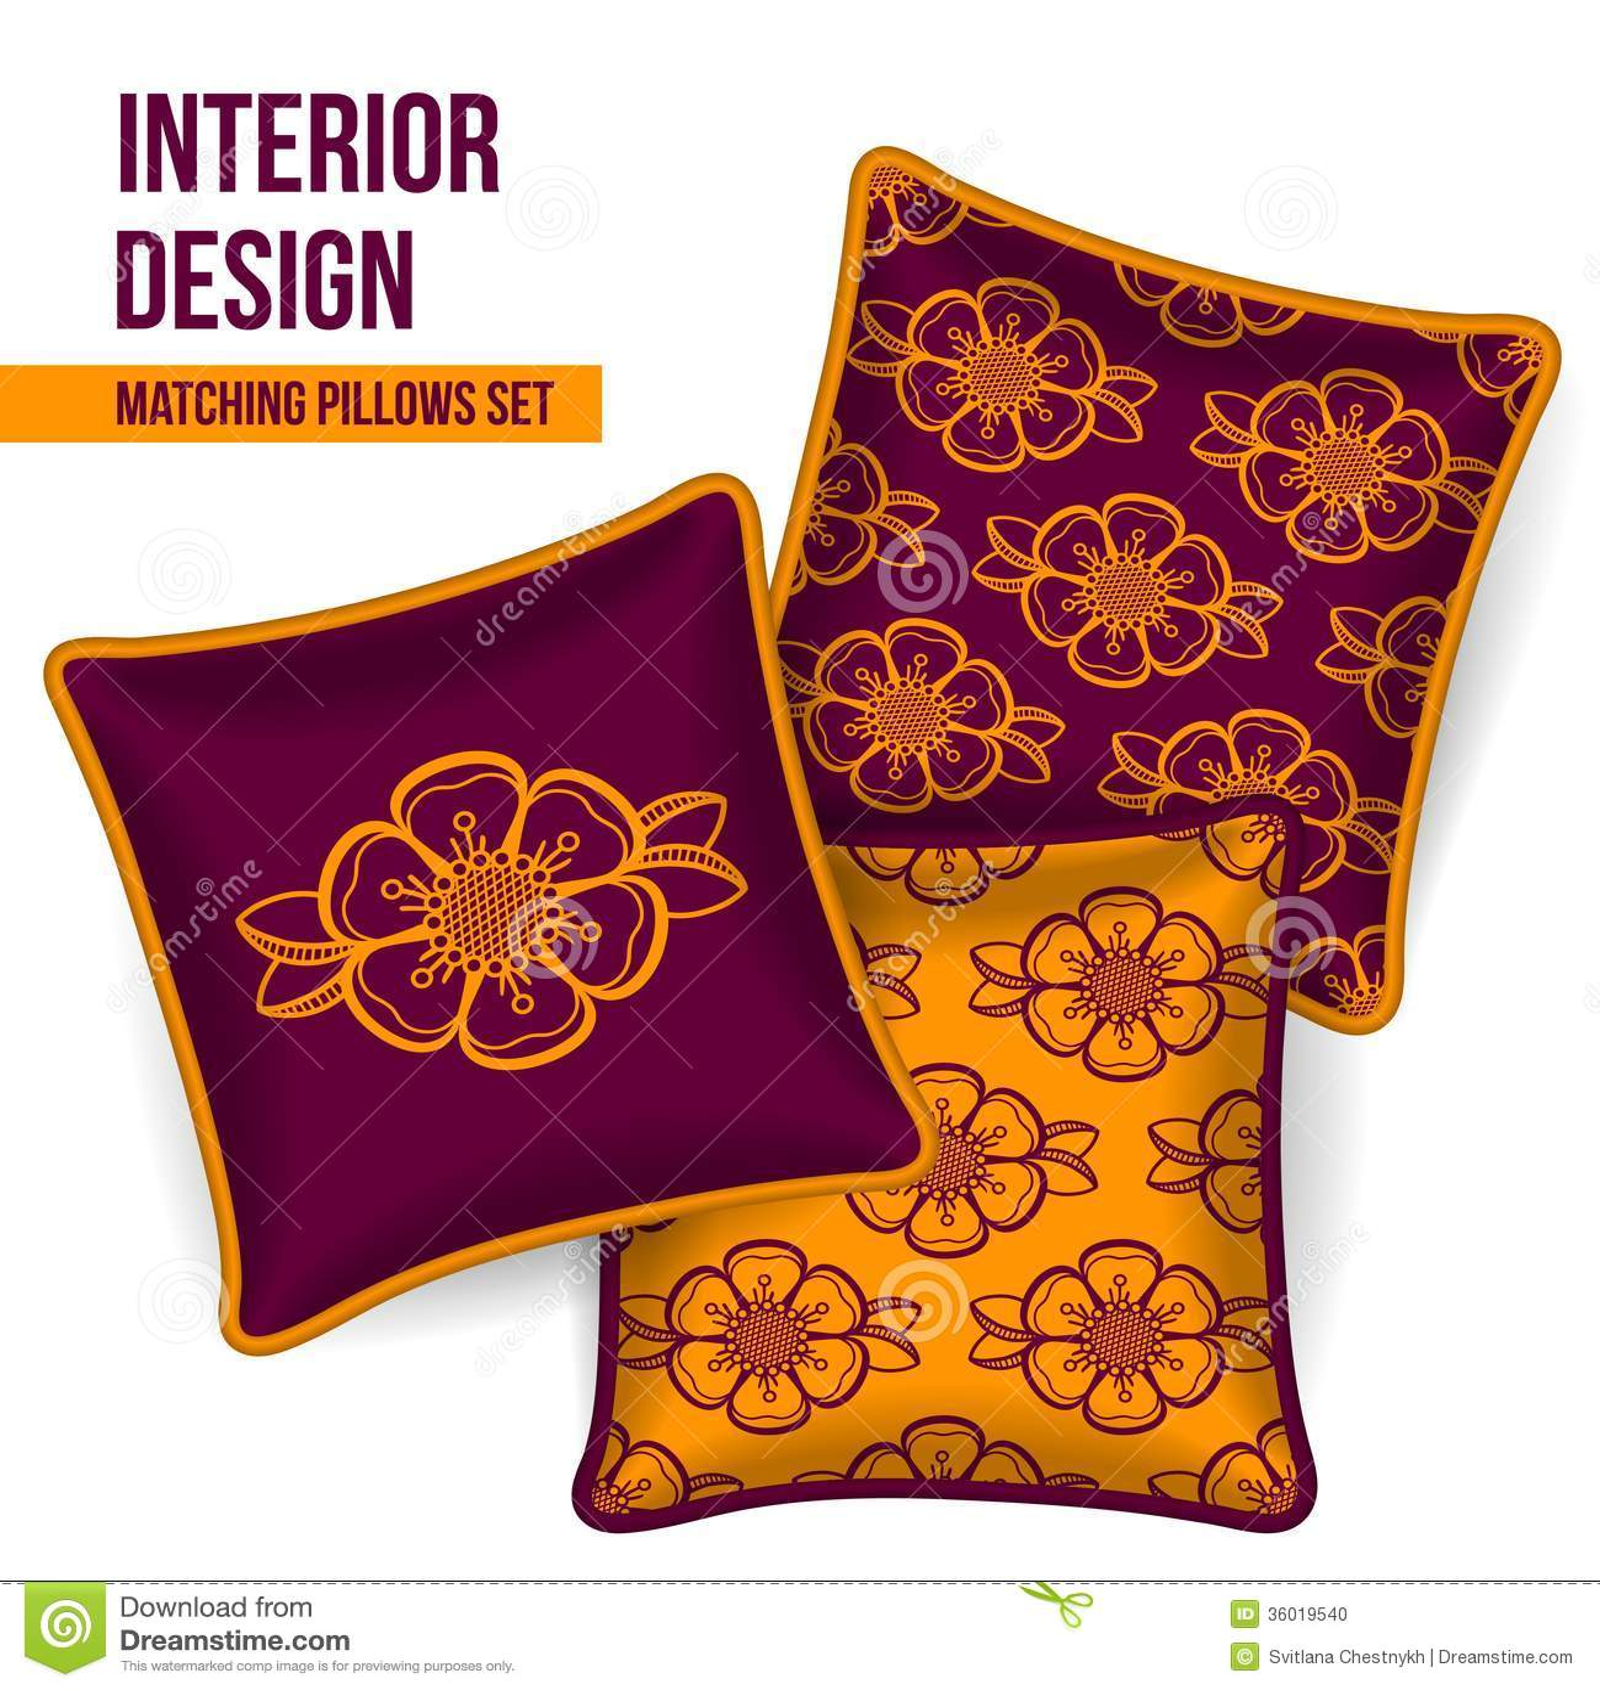 Throw Pillows With Matching Rug : Set Of Decorative Pillow Stock Photo - Image: 36019540